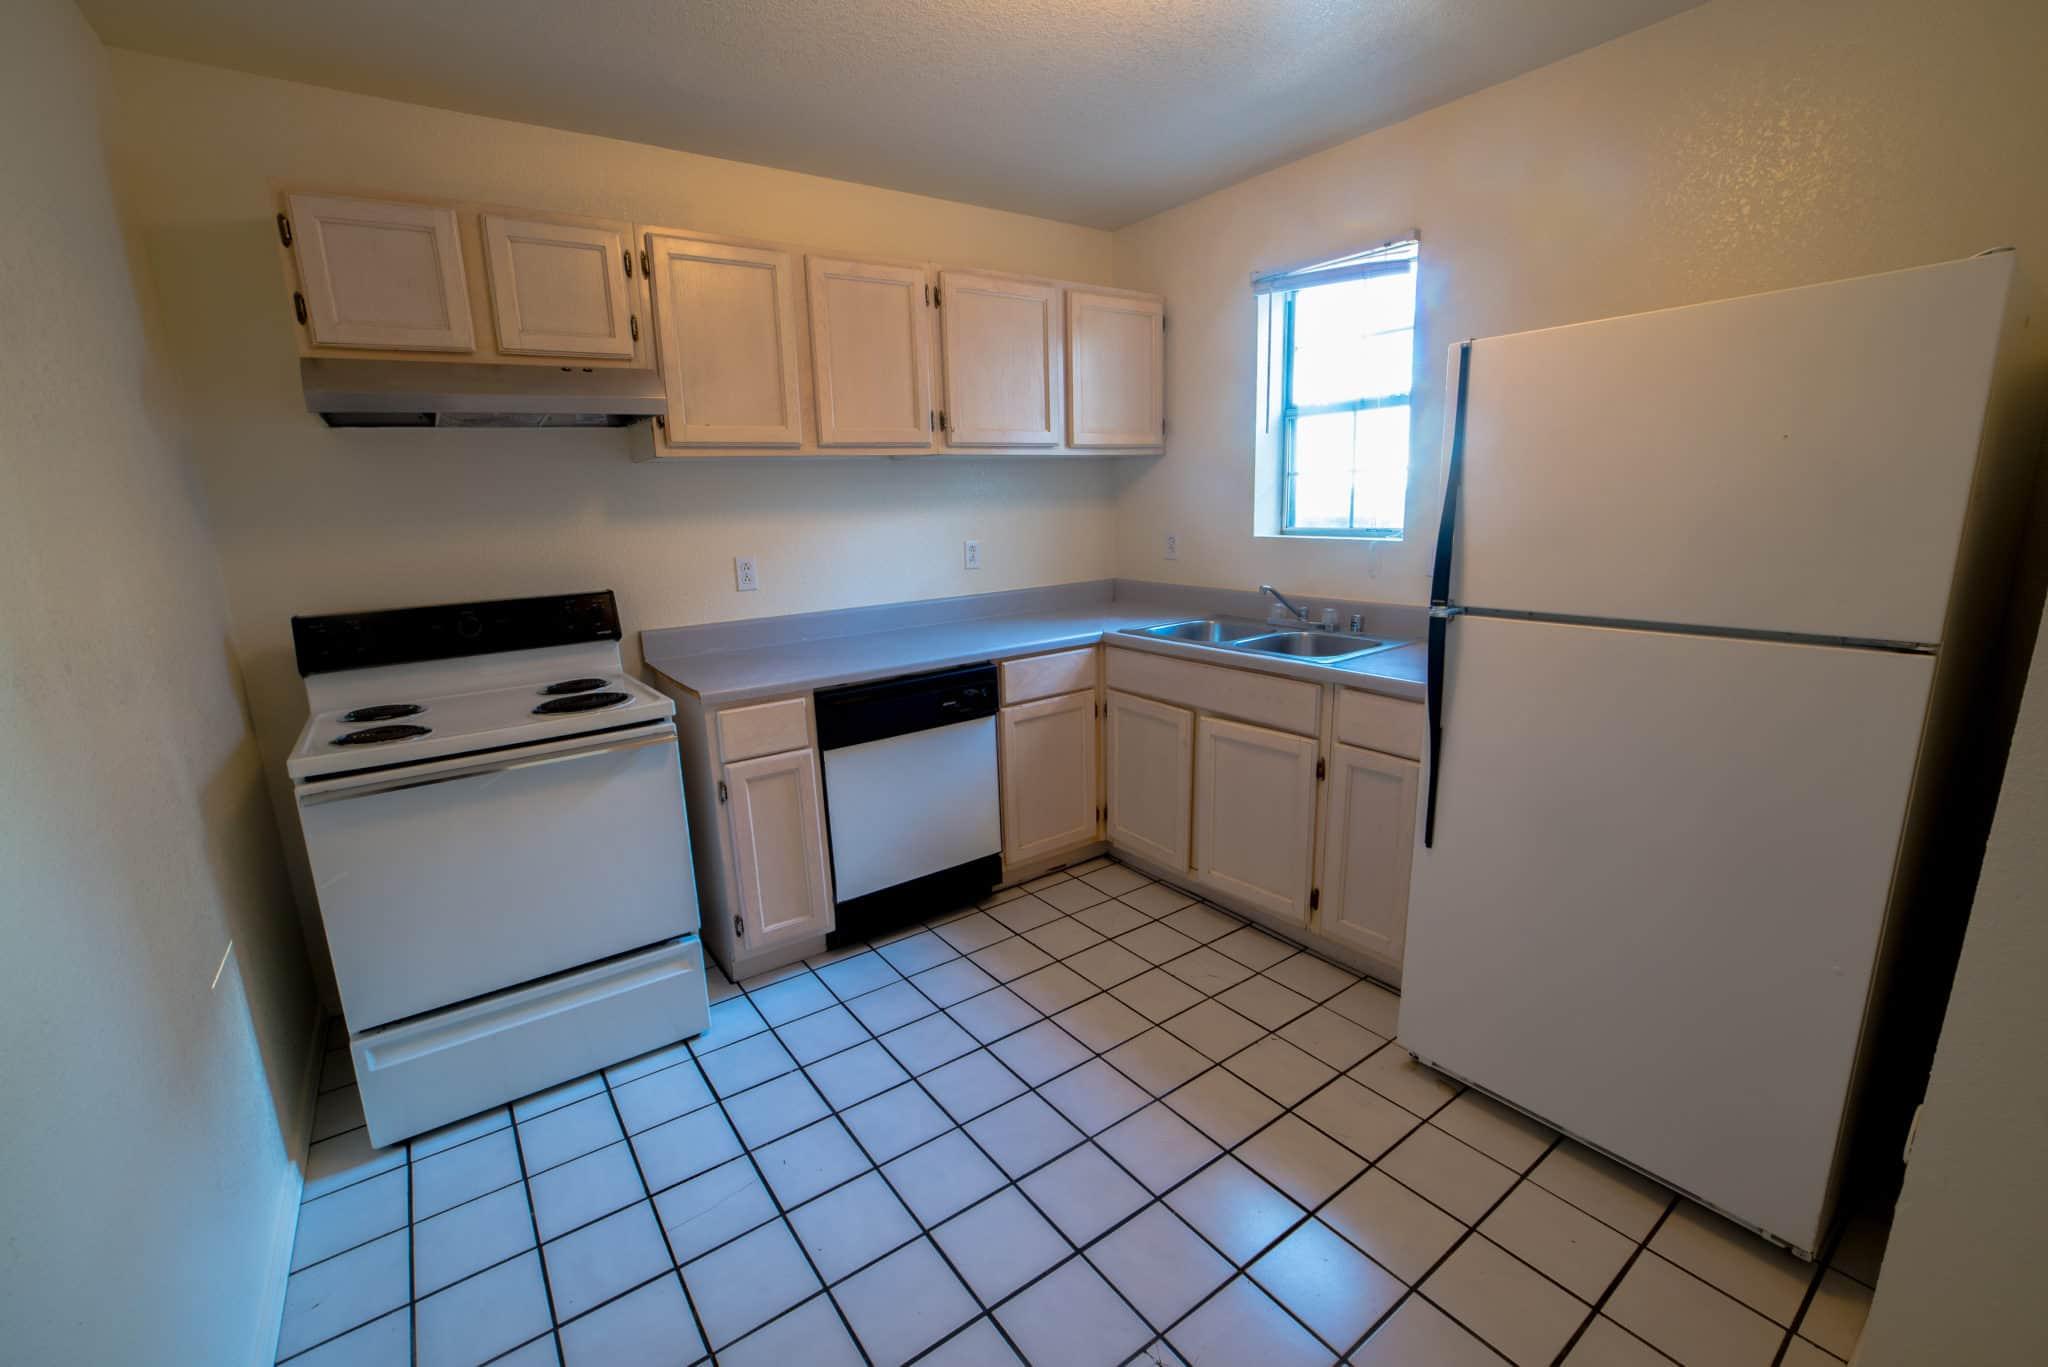 Centre Square 2 bedroom - Kitchen